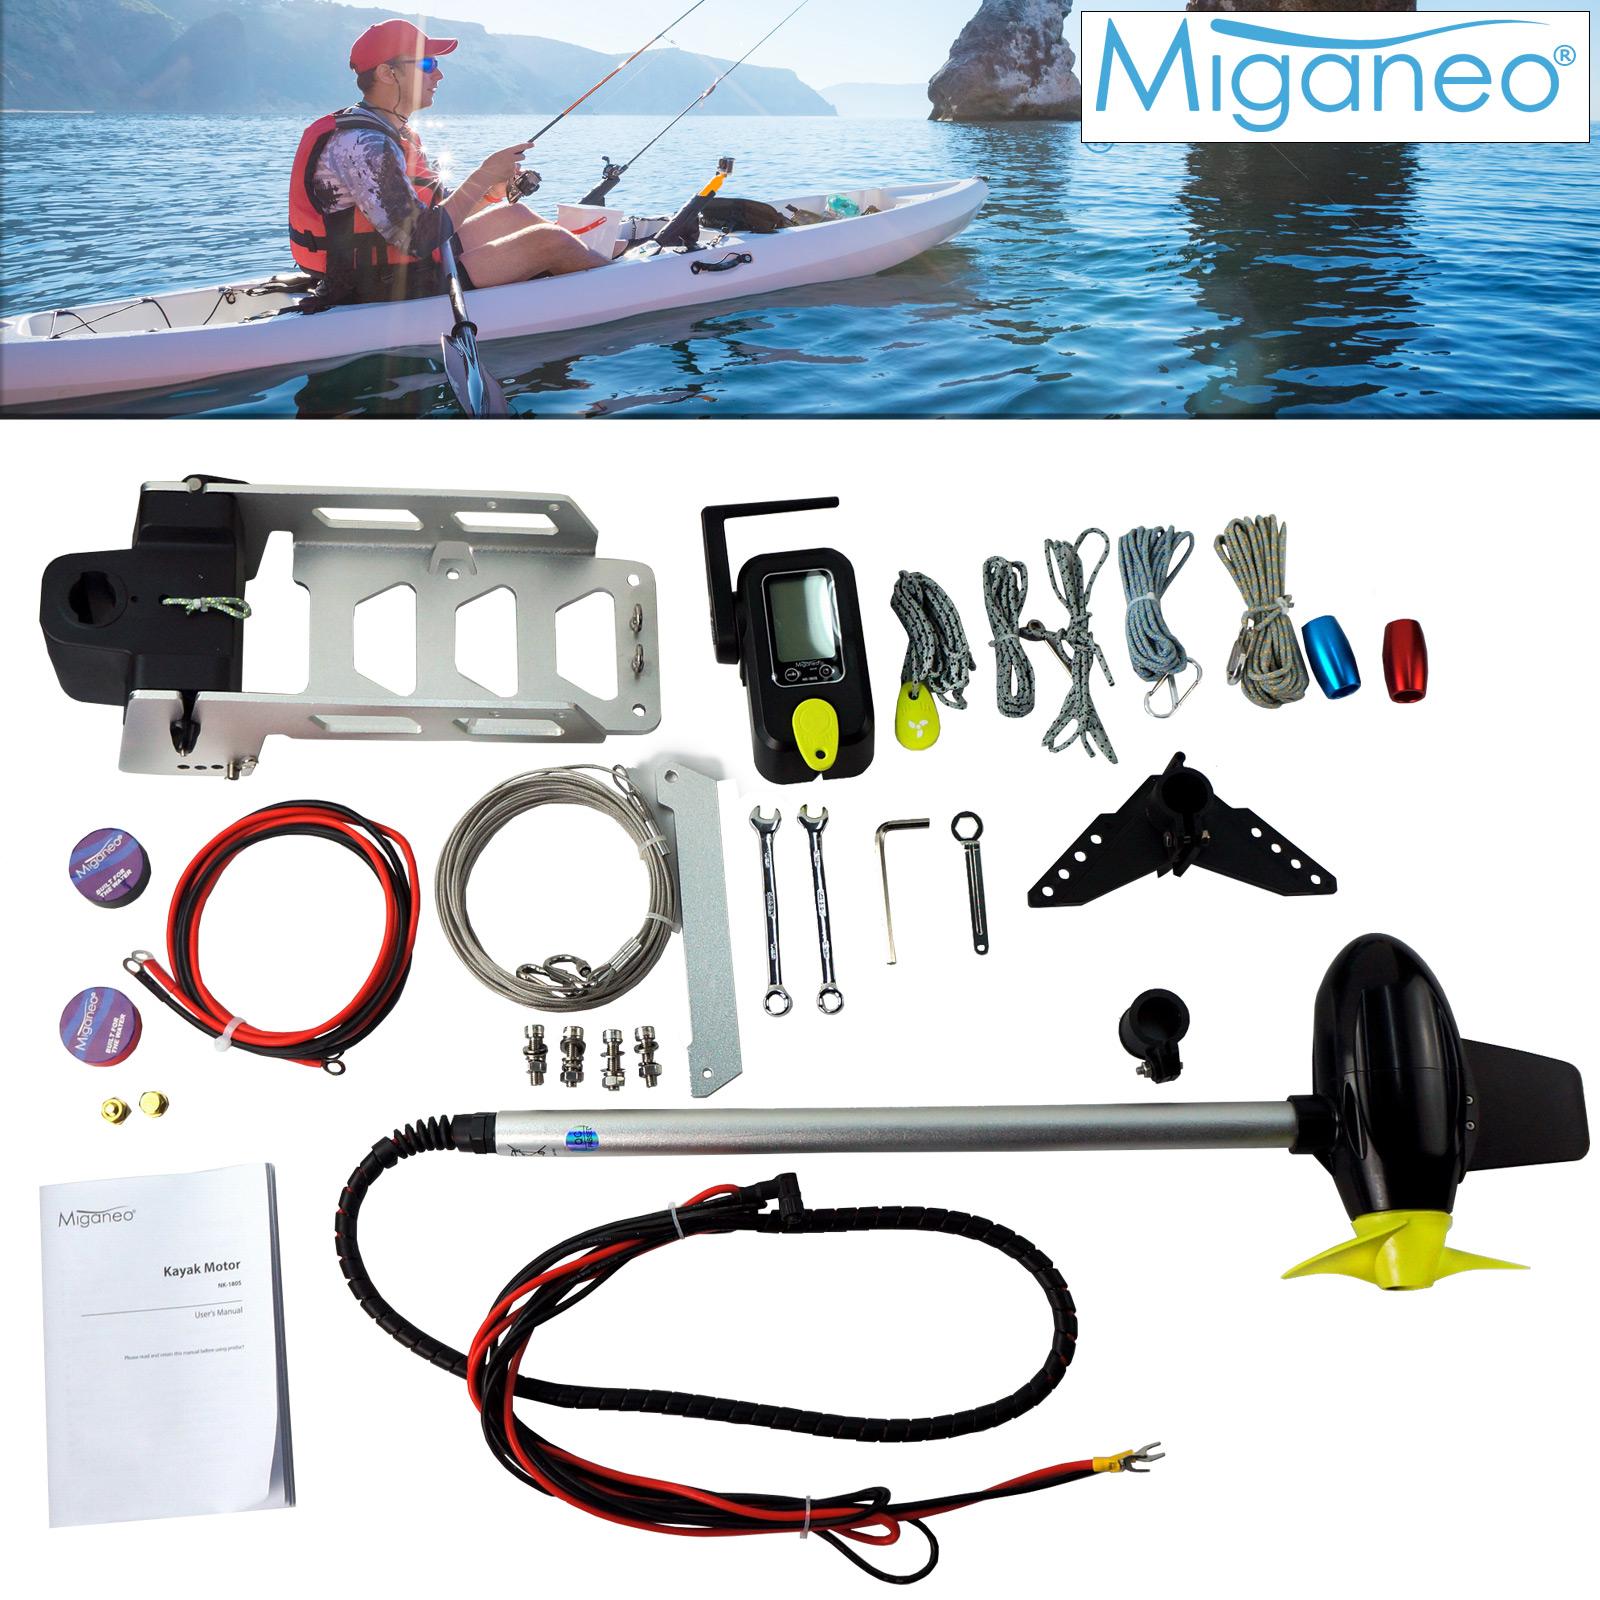 Miganeo Bootsmotor für Kajak Komplett-Set